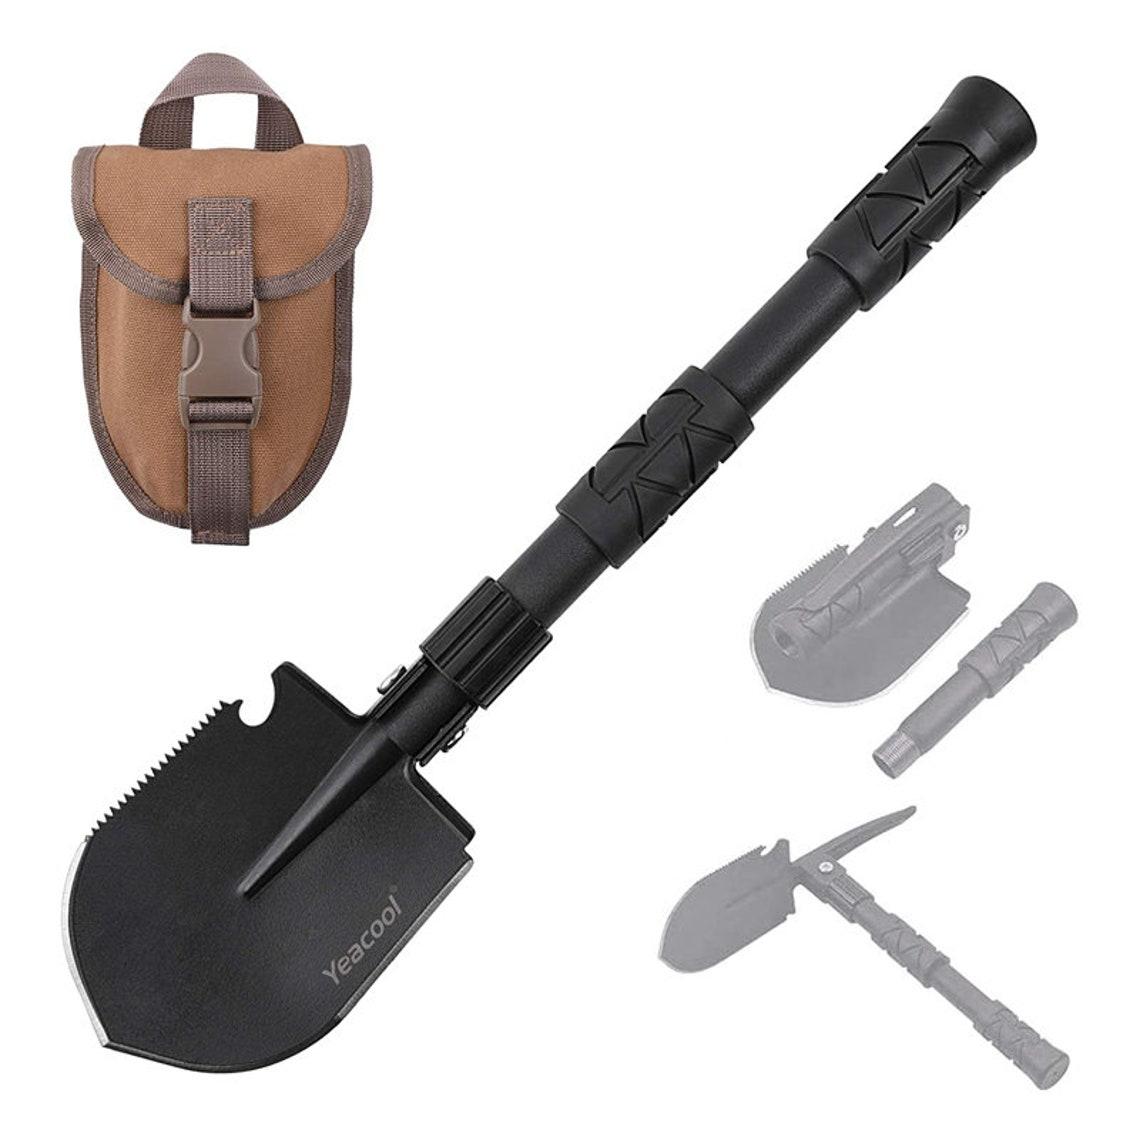 Camping Shovel Foldable, Folding Trench Shovel